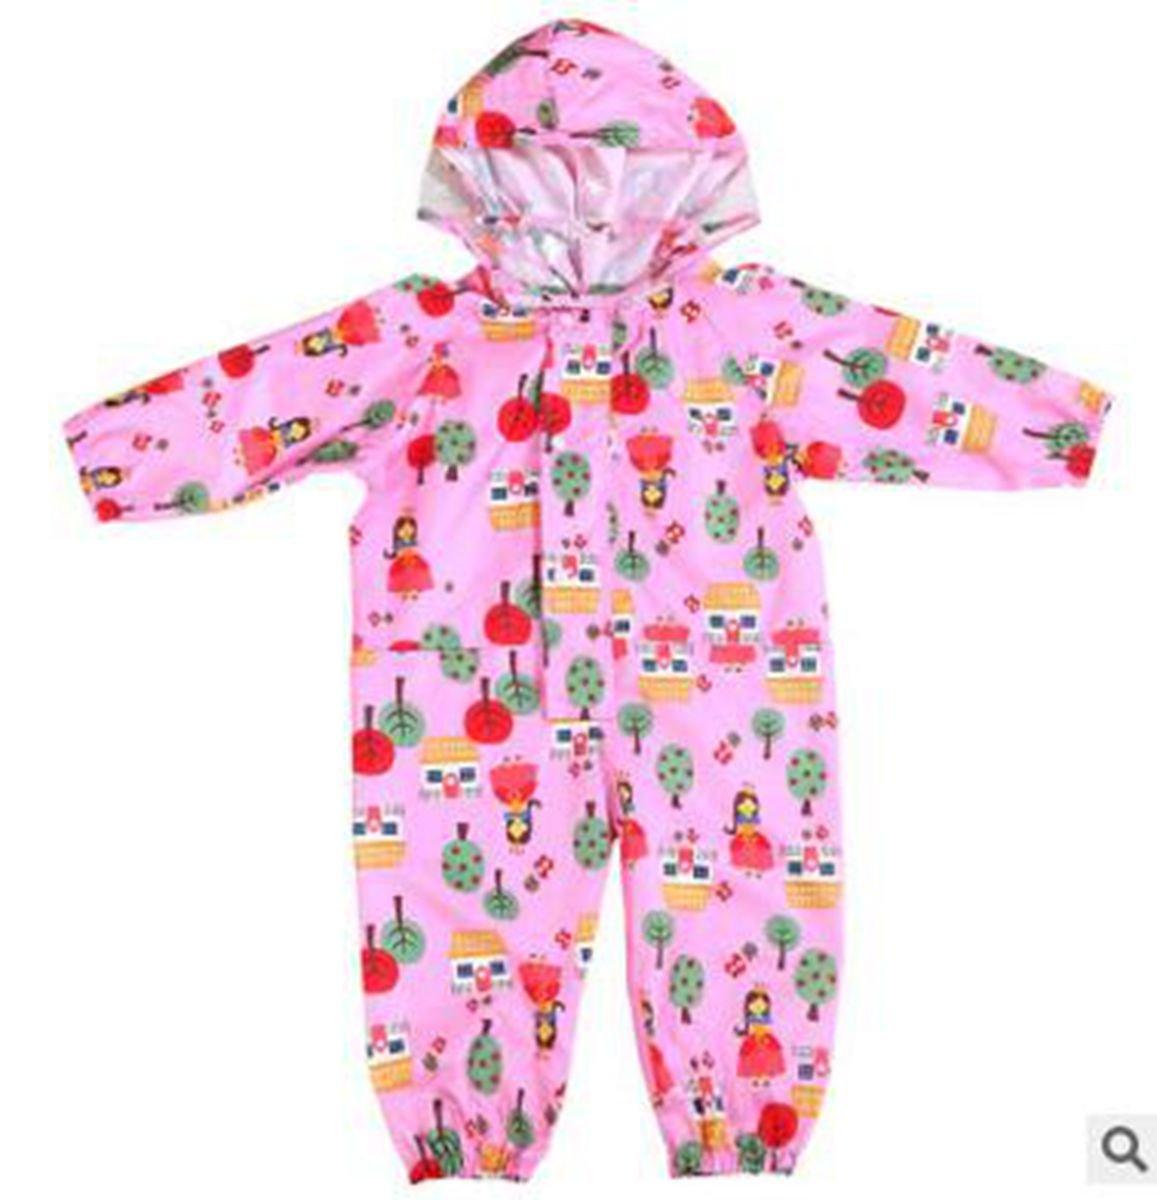 VANORIG Environmentable Odorless Children One- Piece Raincoat Cartoon Outwear Raincoat For Baby Girls & Boys(Pink, S) by VANORIG